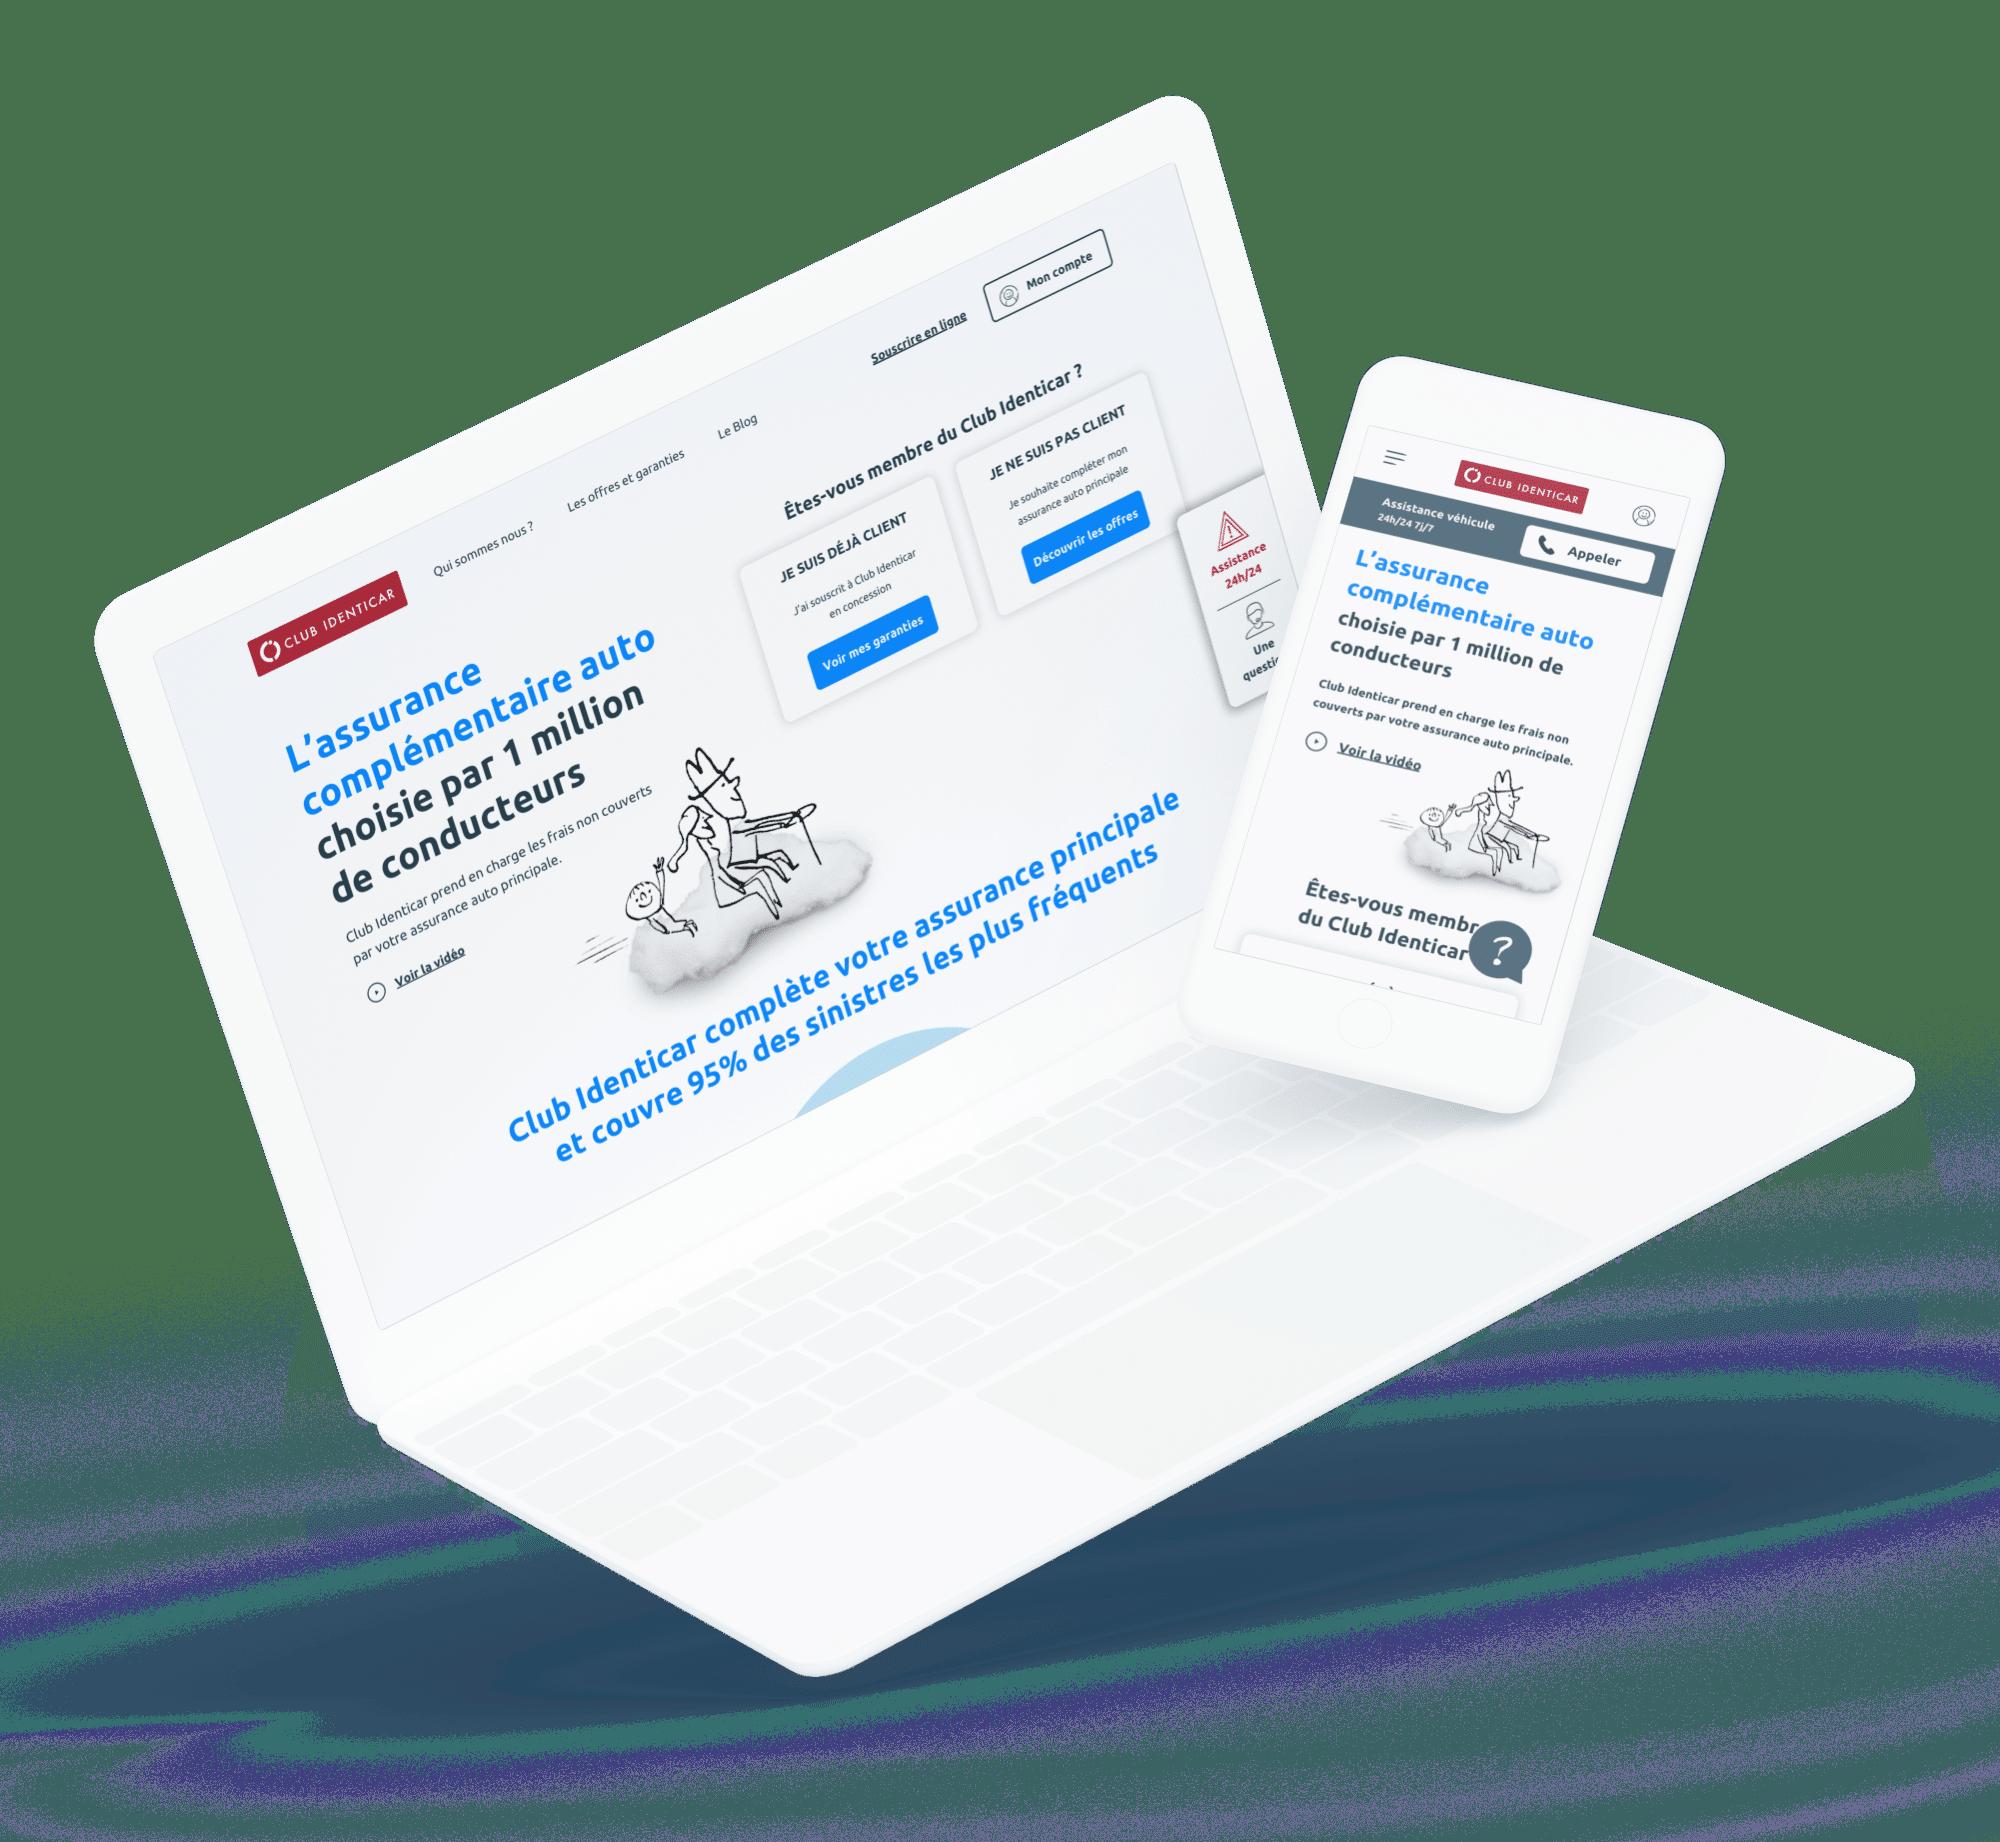 Club Identicar (Site vitrine B2C) - Site desktop et mobile